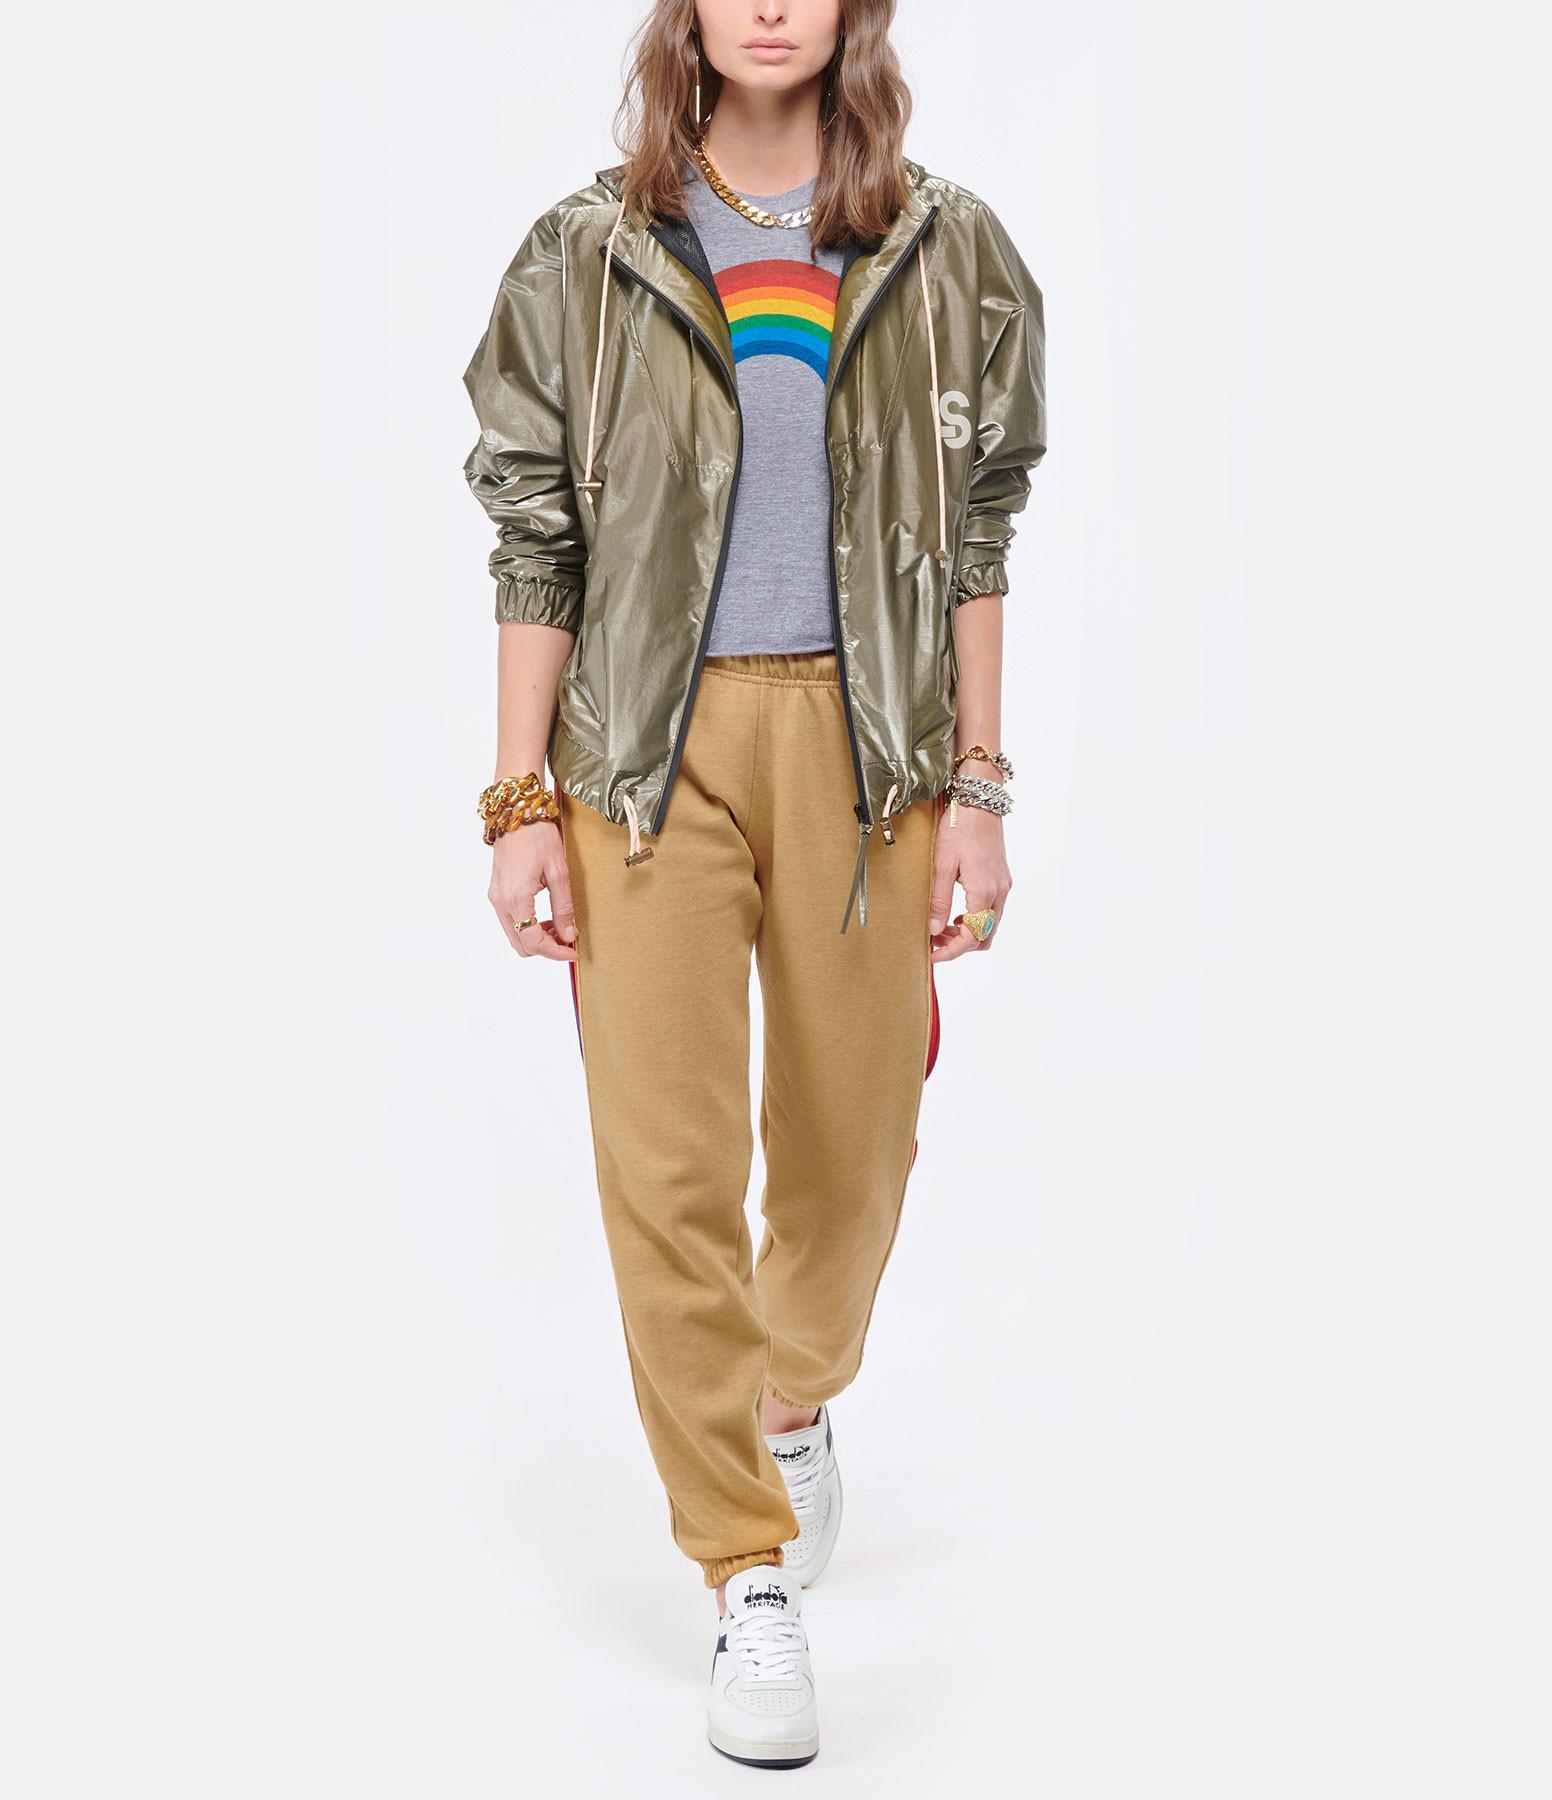 AVIATOR NATION - Tee-shirt Rainbow Gris Chiné